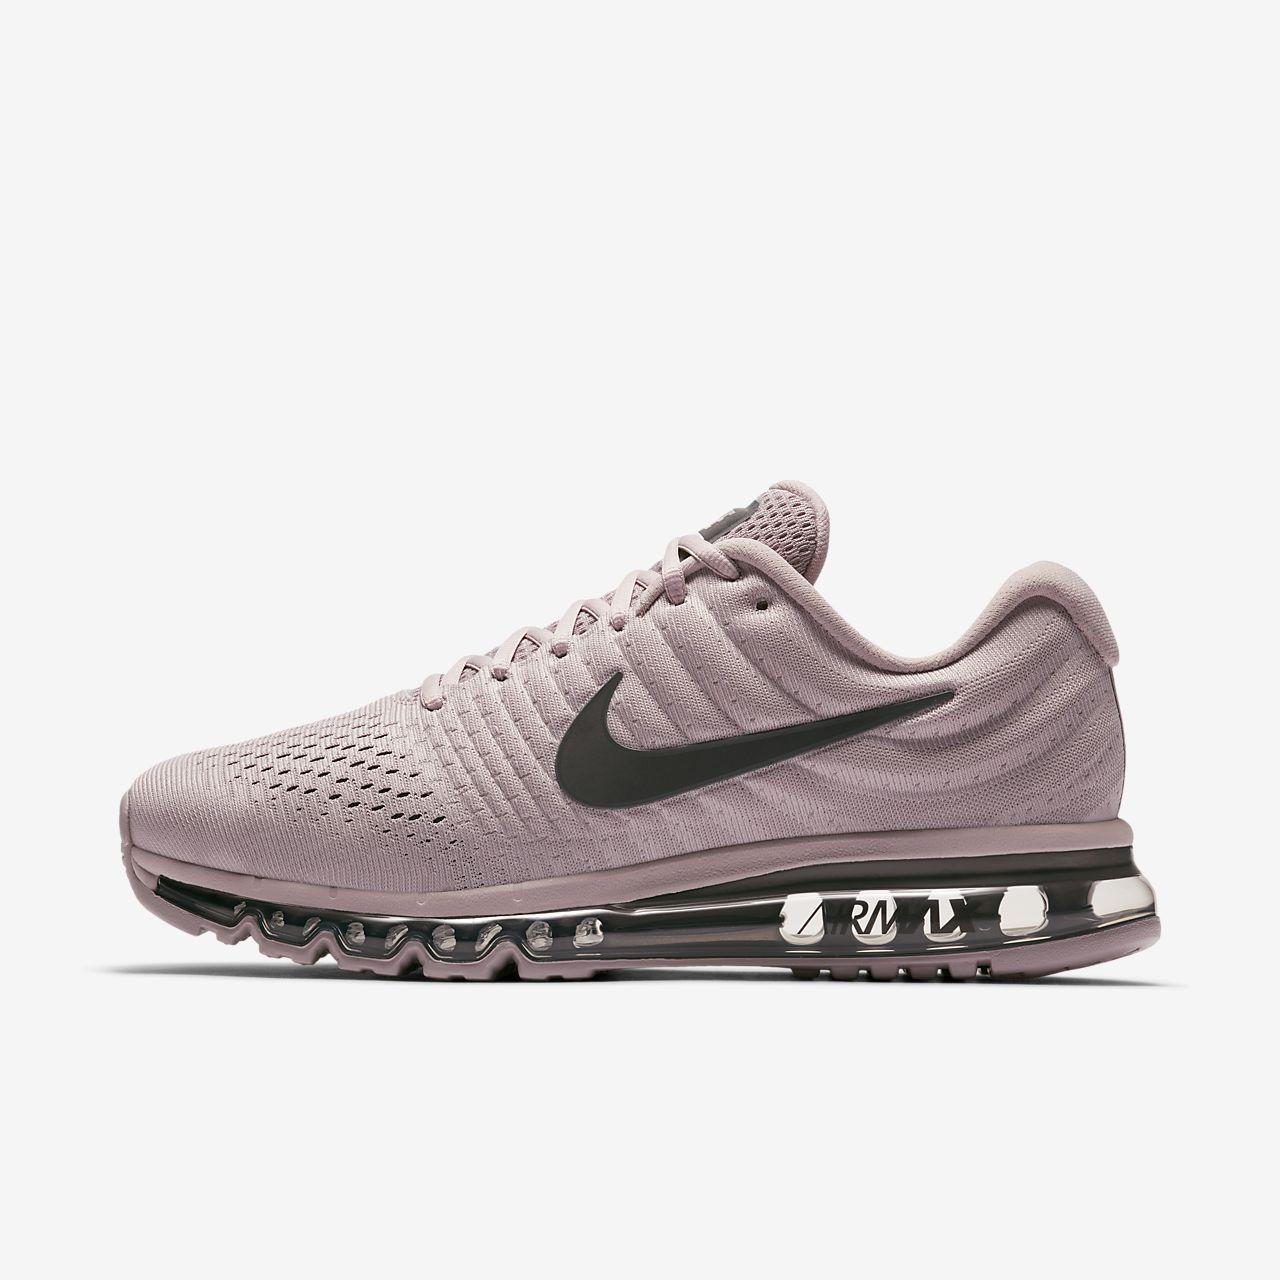 timeless design 14dac 4768a ... Calzado para hombre Nike Air Max 2017 SE